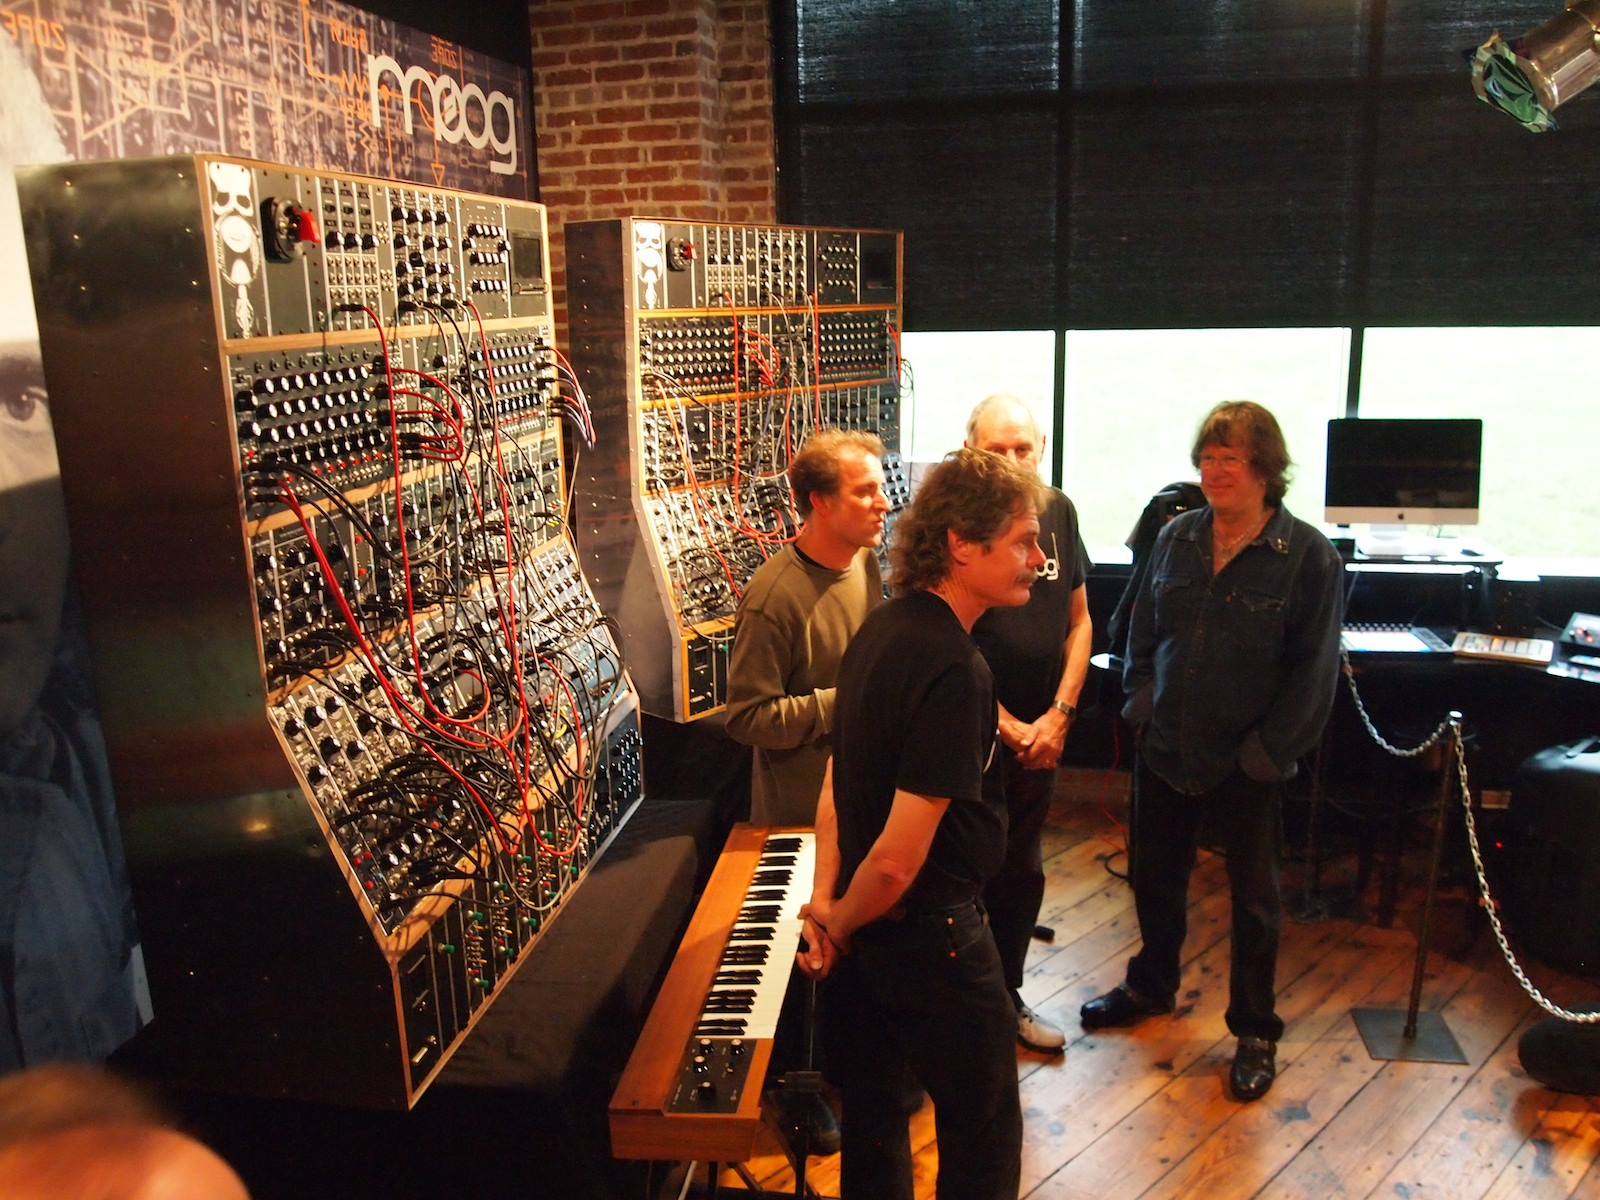 Modular Synthesizer Concert : moog really is recreating keith emerson 39 s modular in biggest analog relaunch ever cdm create ~ Vivirlamusica.com Haus und Dekorationen